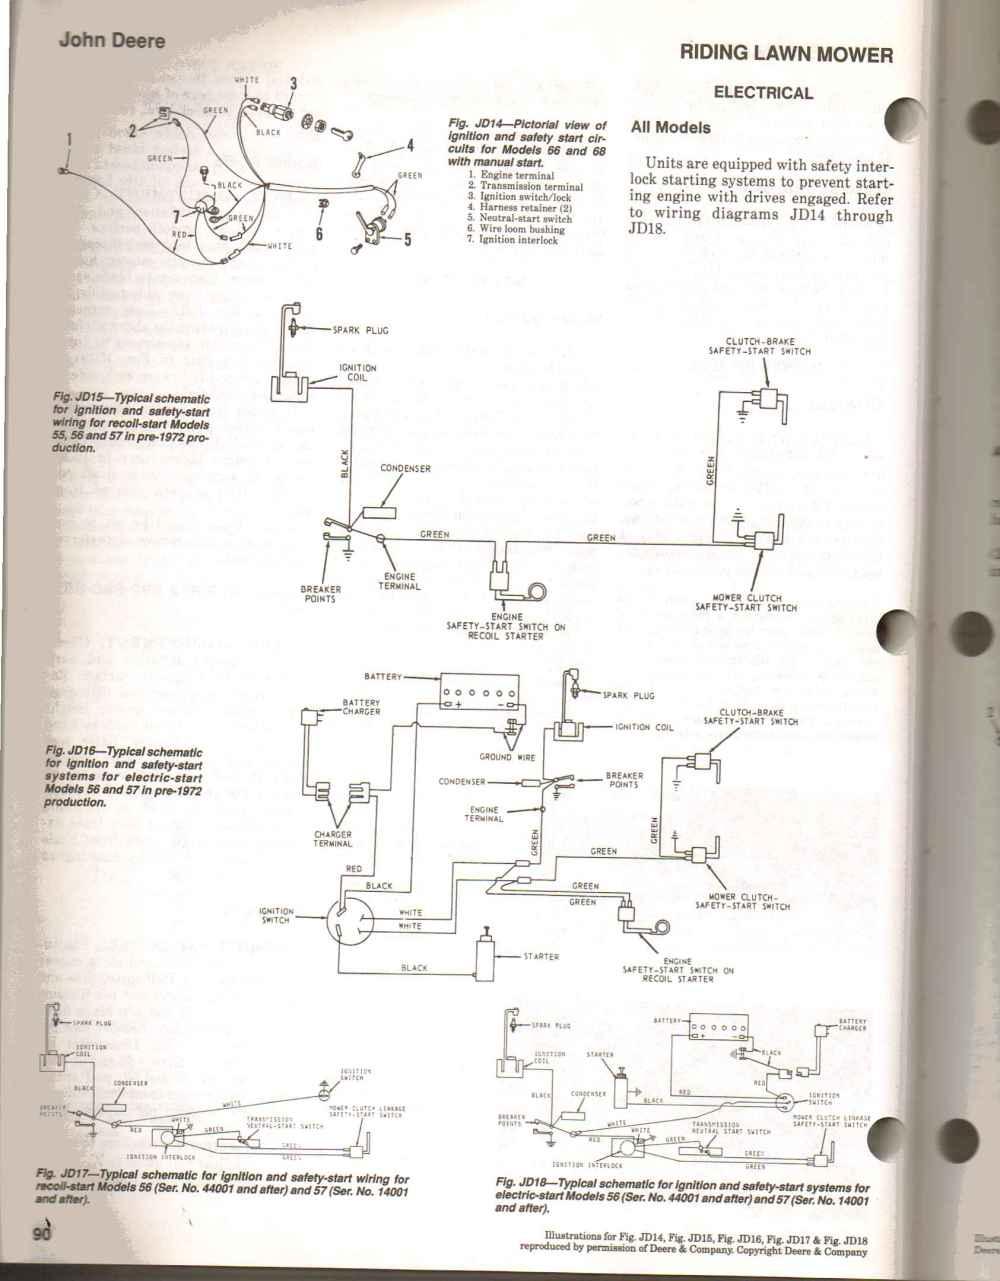 medium resolution of john deere 5103 wiring diagram john deere 4320 wiring diagram john deere 790 wiring